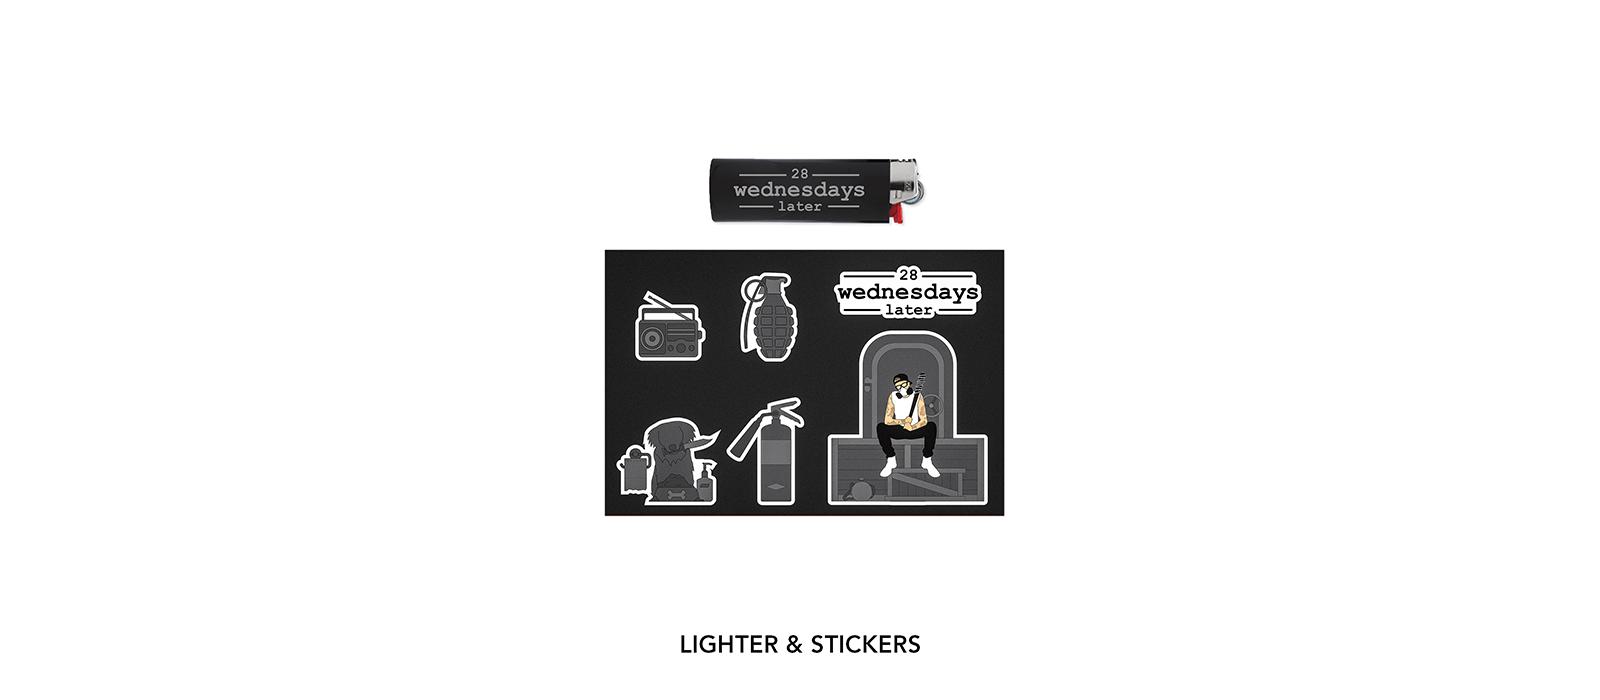 28 Wednesdays Later Lighter Sticker